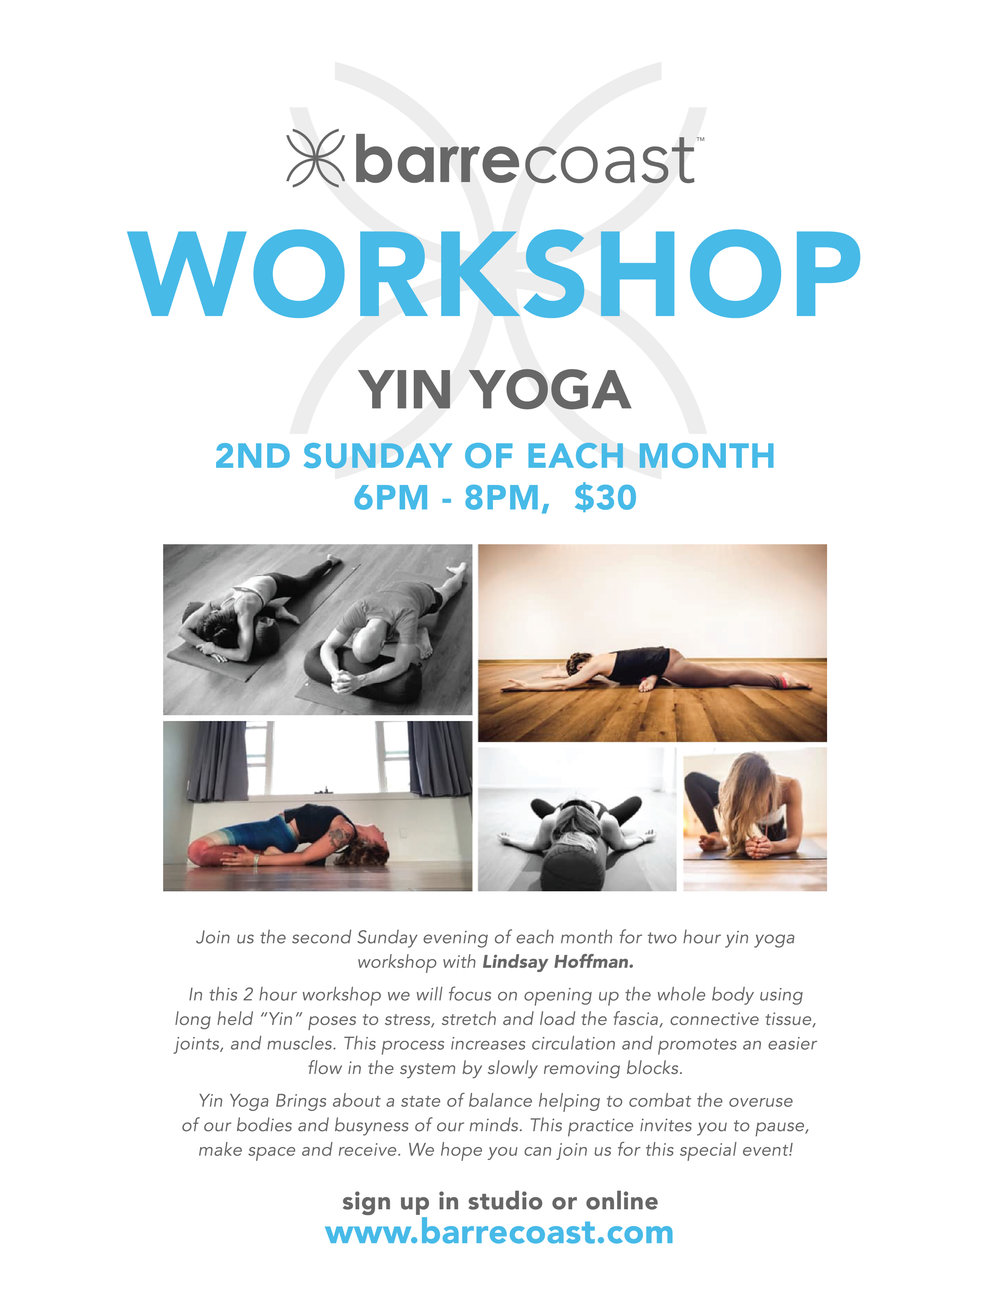 barre-coast-yin-yoga-workshop.jpg